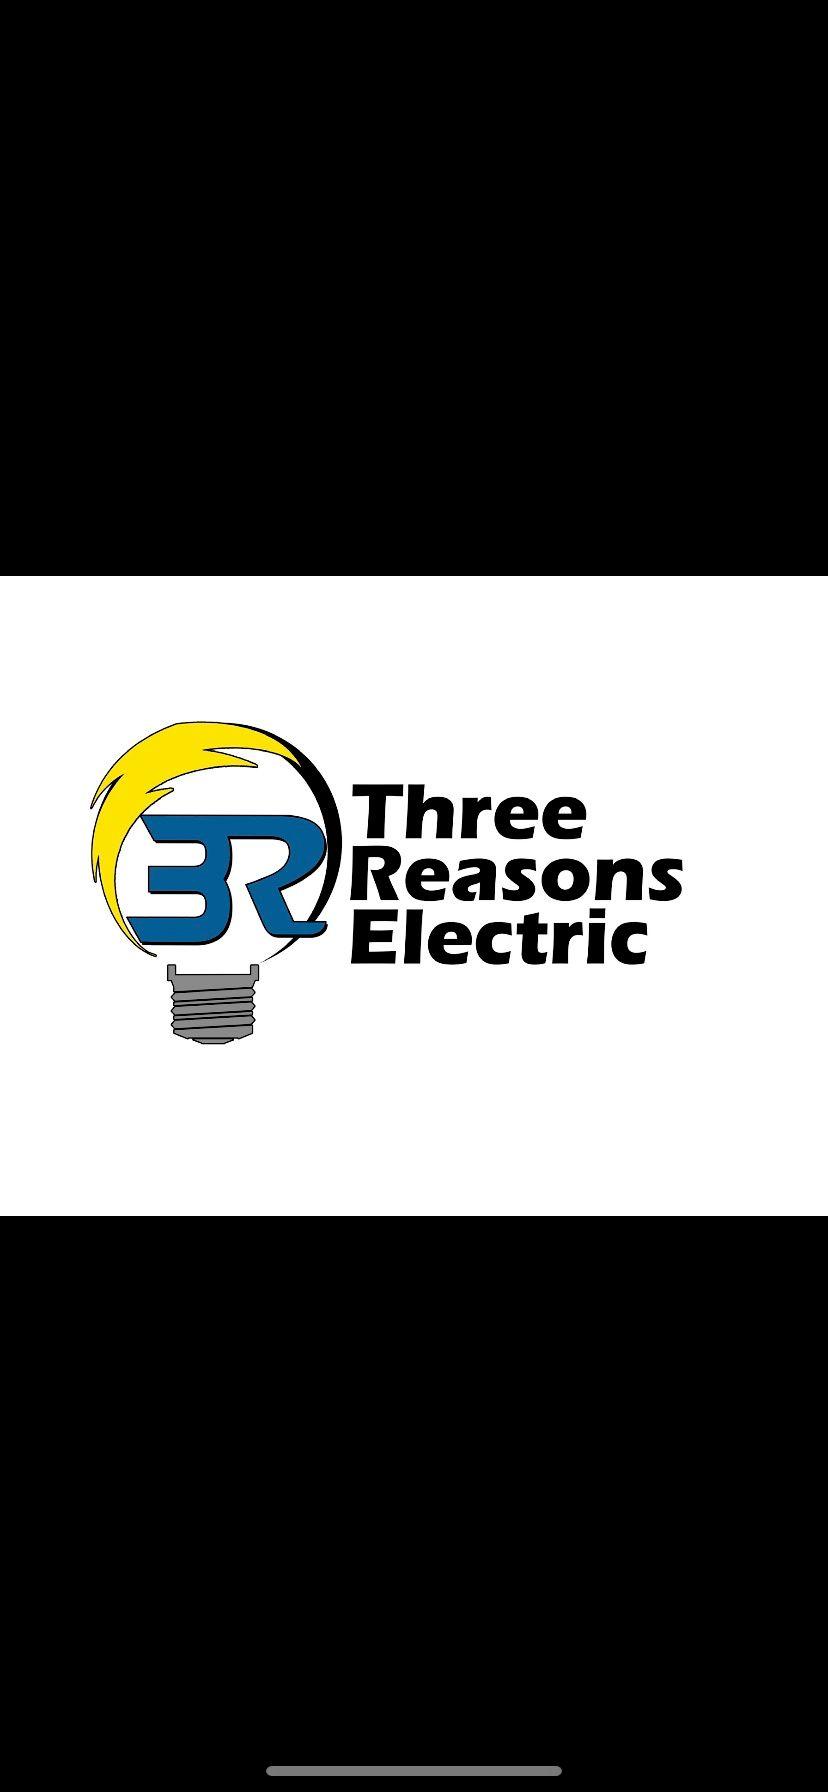 Three Reasons Electric